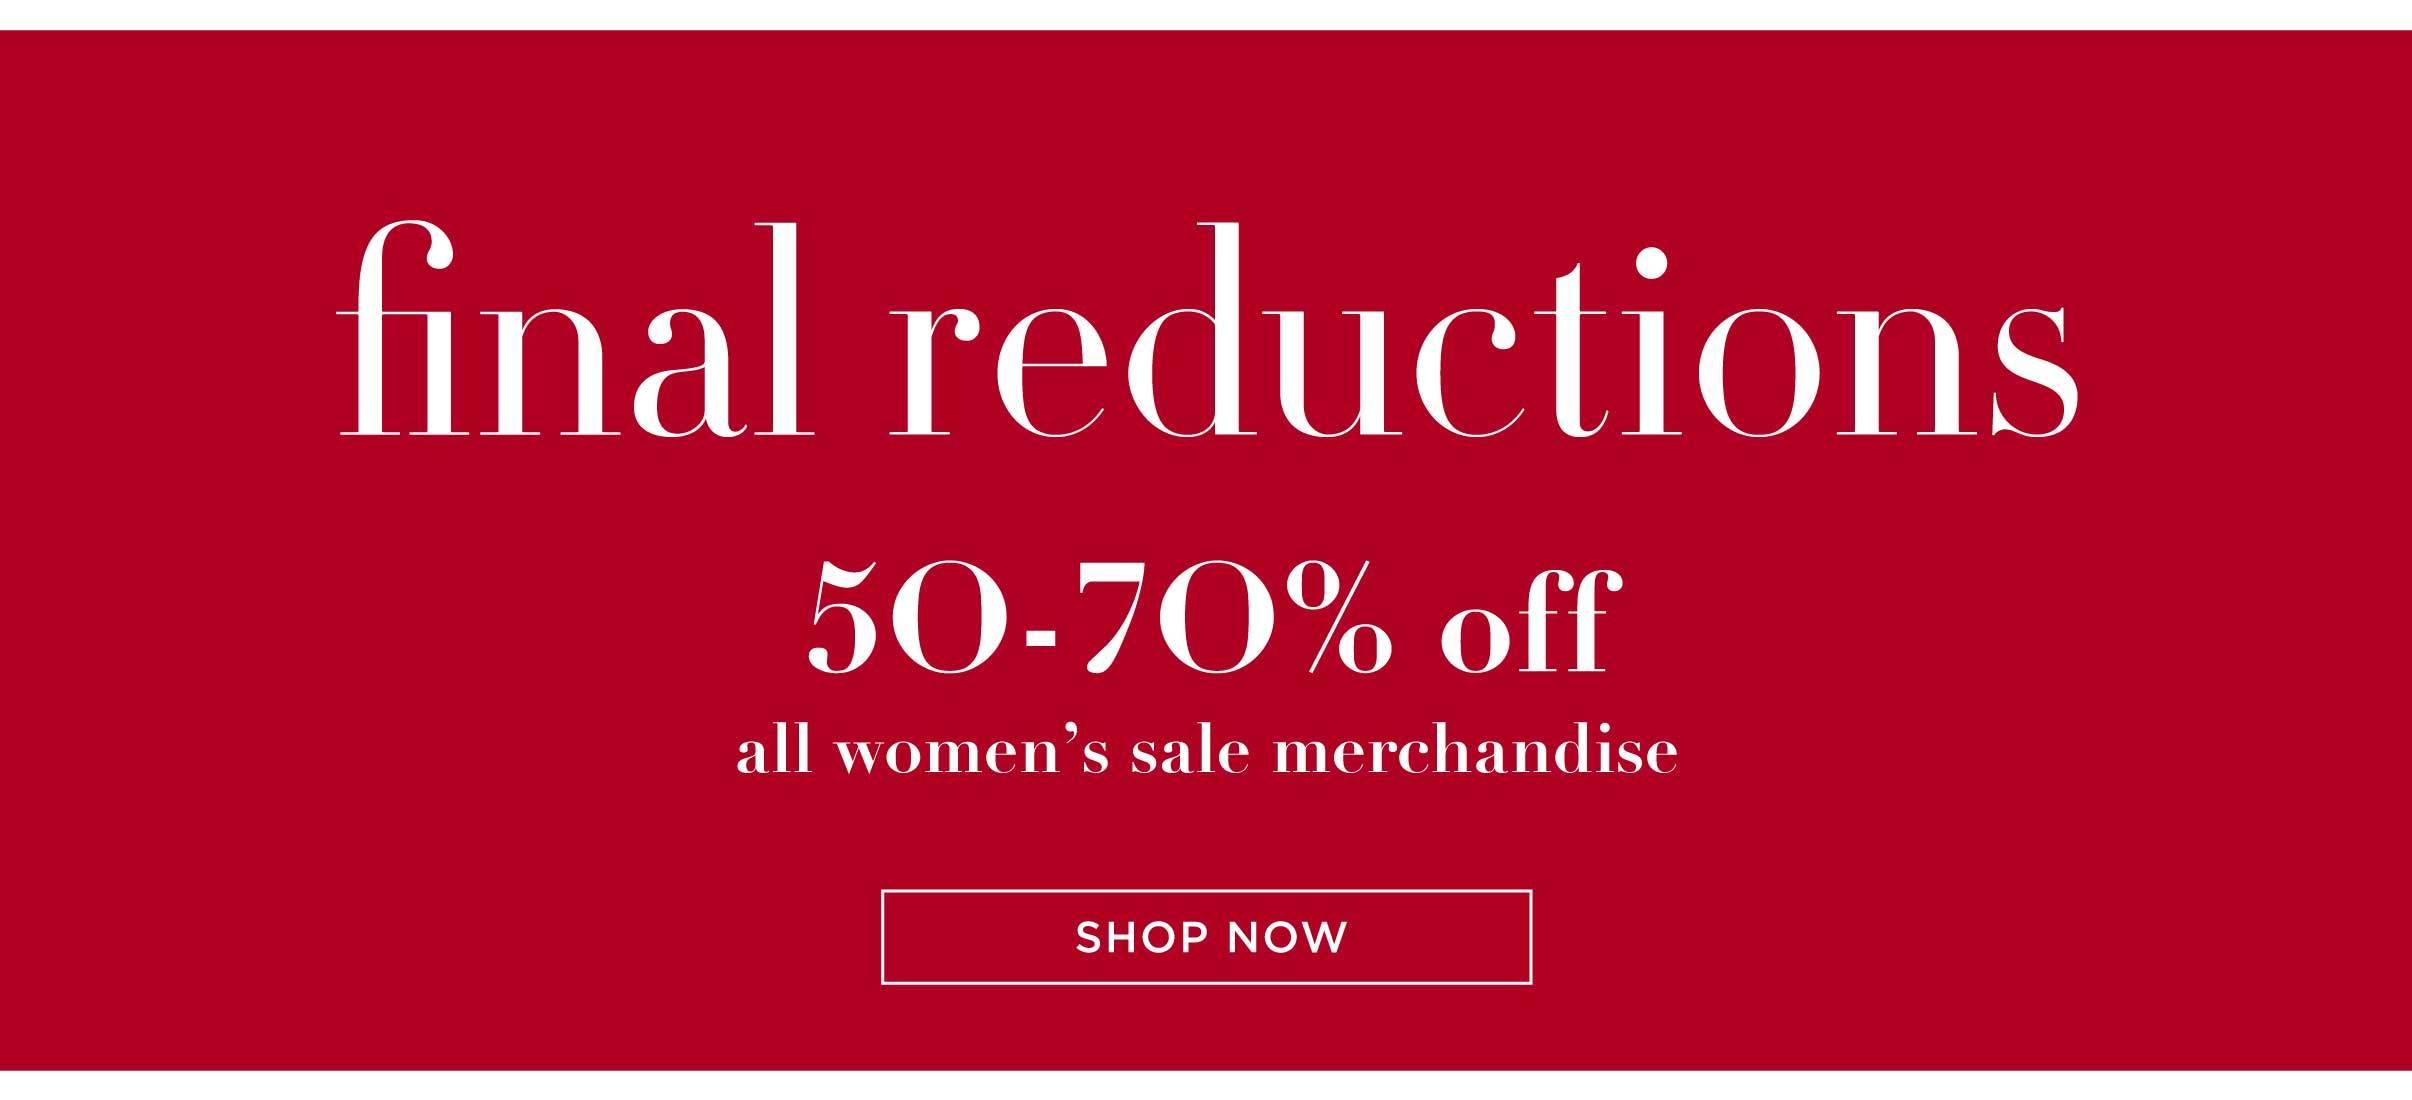 Sale keeps getting better